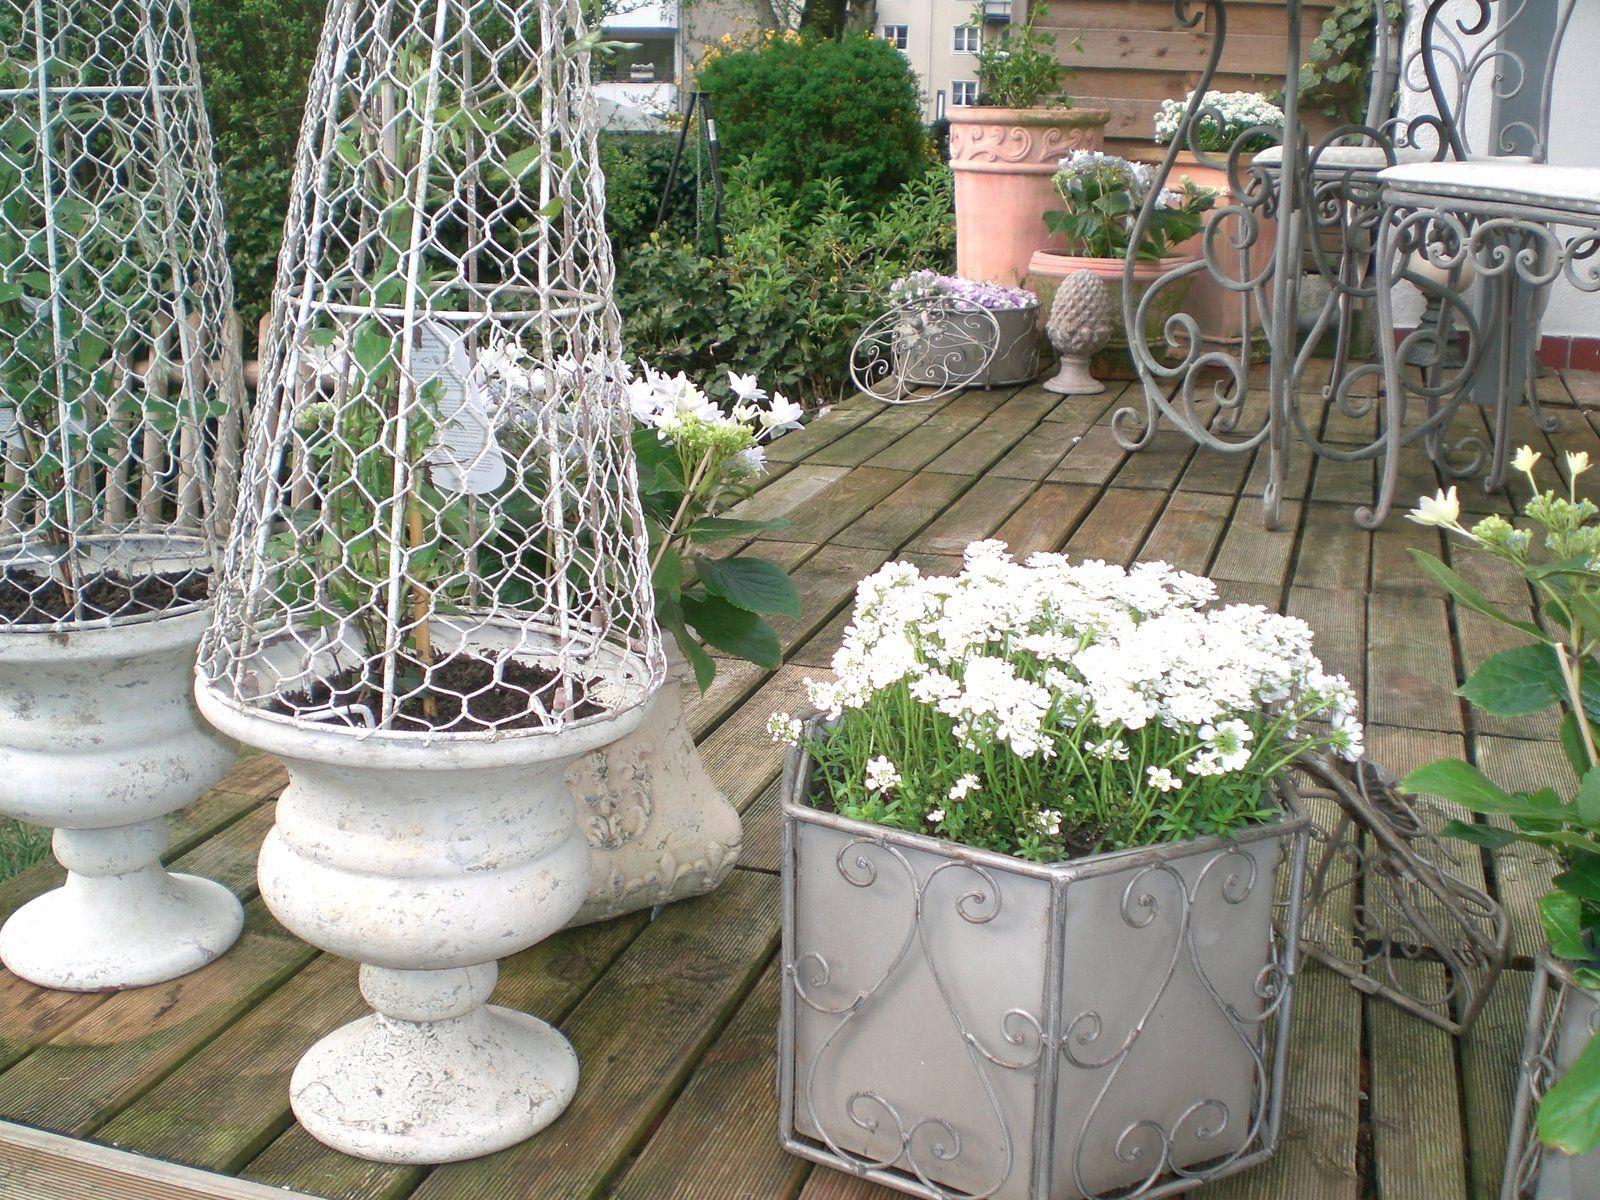 deck ideas tomato plant cage & chicken wire, why didn't I